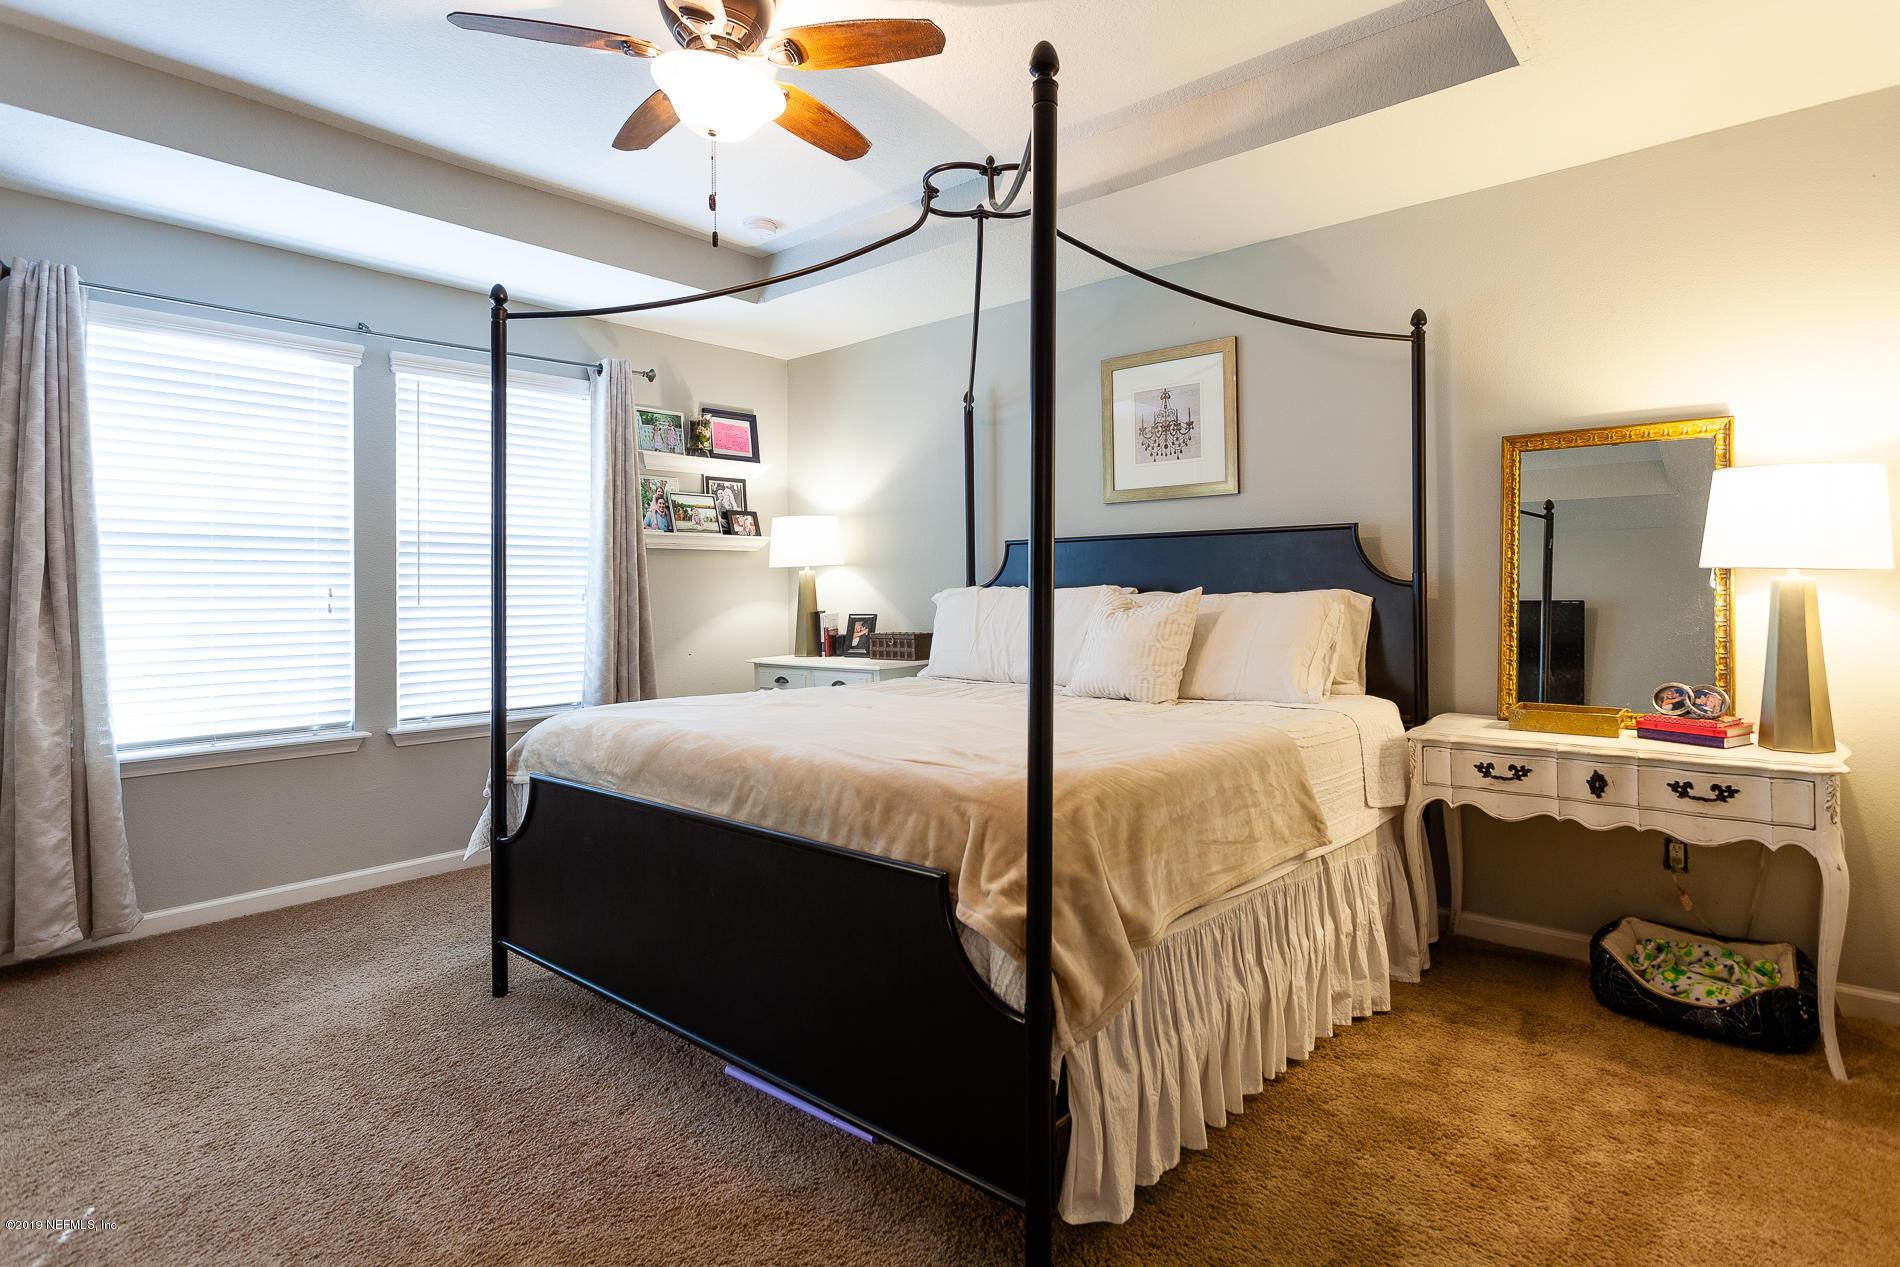 475 AUBURN OAKS, JACKSONVILLE, FLORIDA 32218, 3 Bedrooms Bedrooms, ,2 BathroomsBathrooms,Residential - single family,For sale,AUBURN OAKS,974153